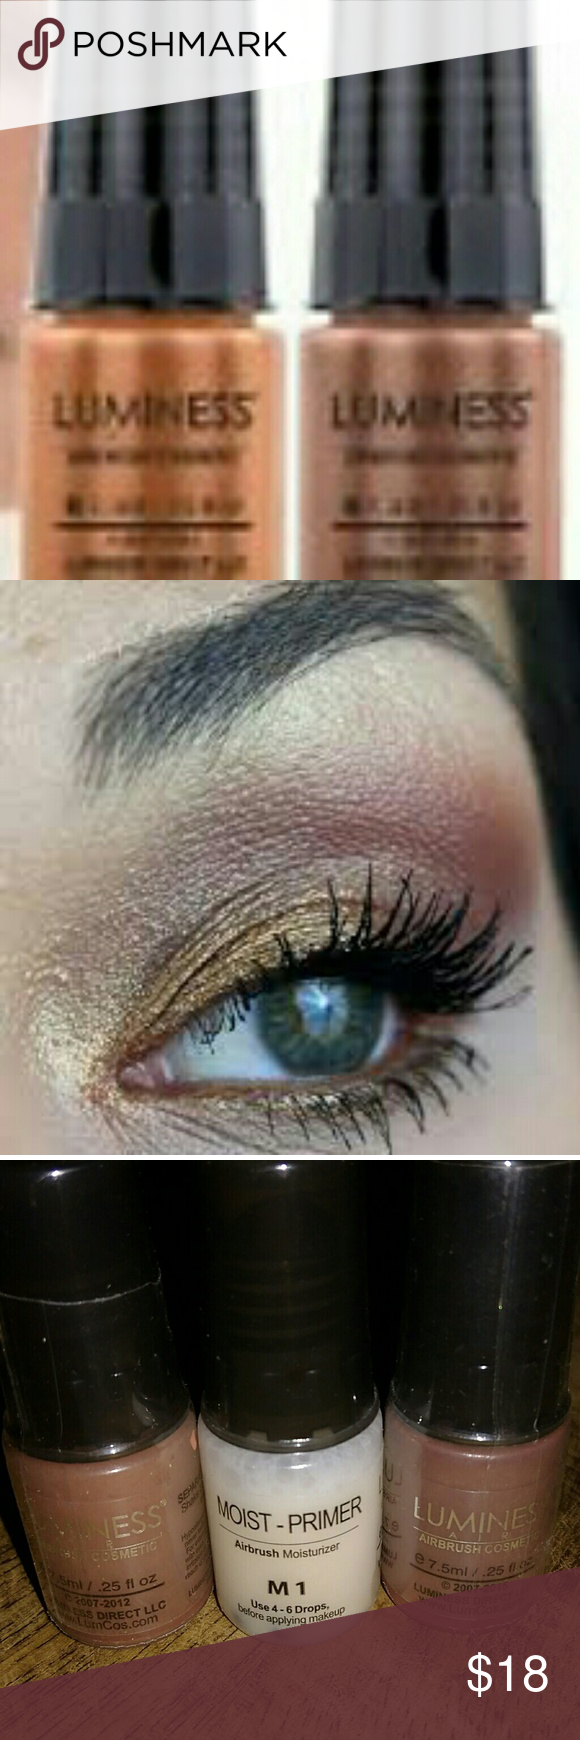 Luminess Air Airbrush Eyeshadow and Primer Eyeshadow